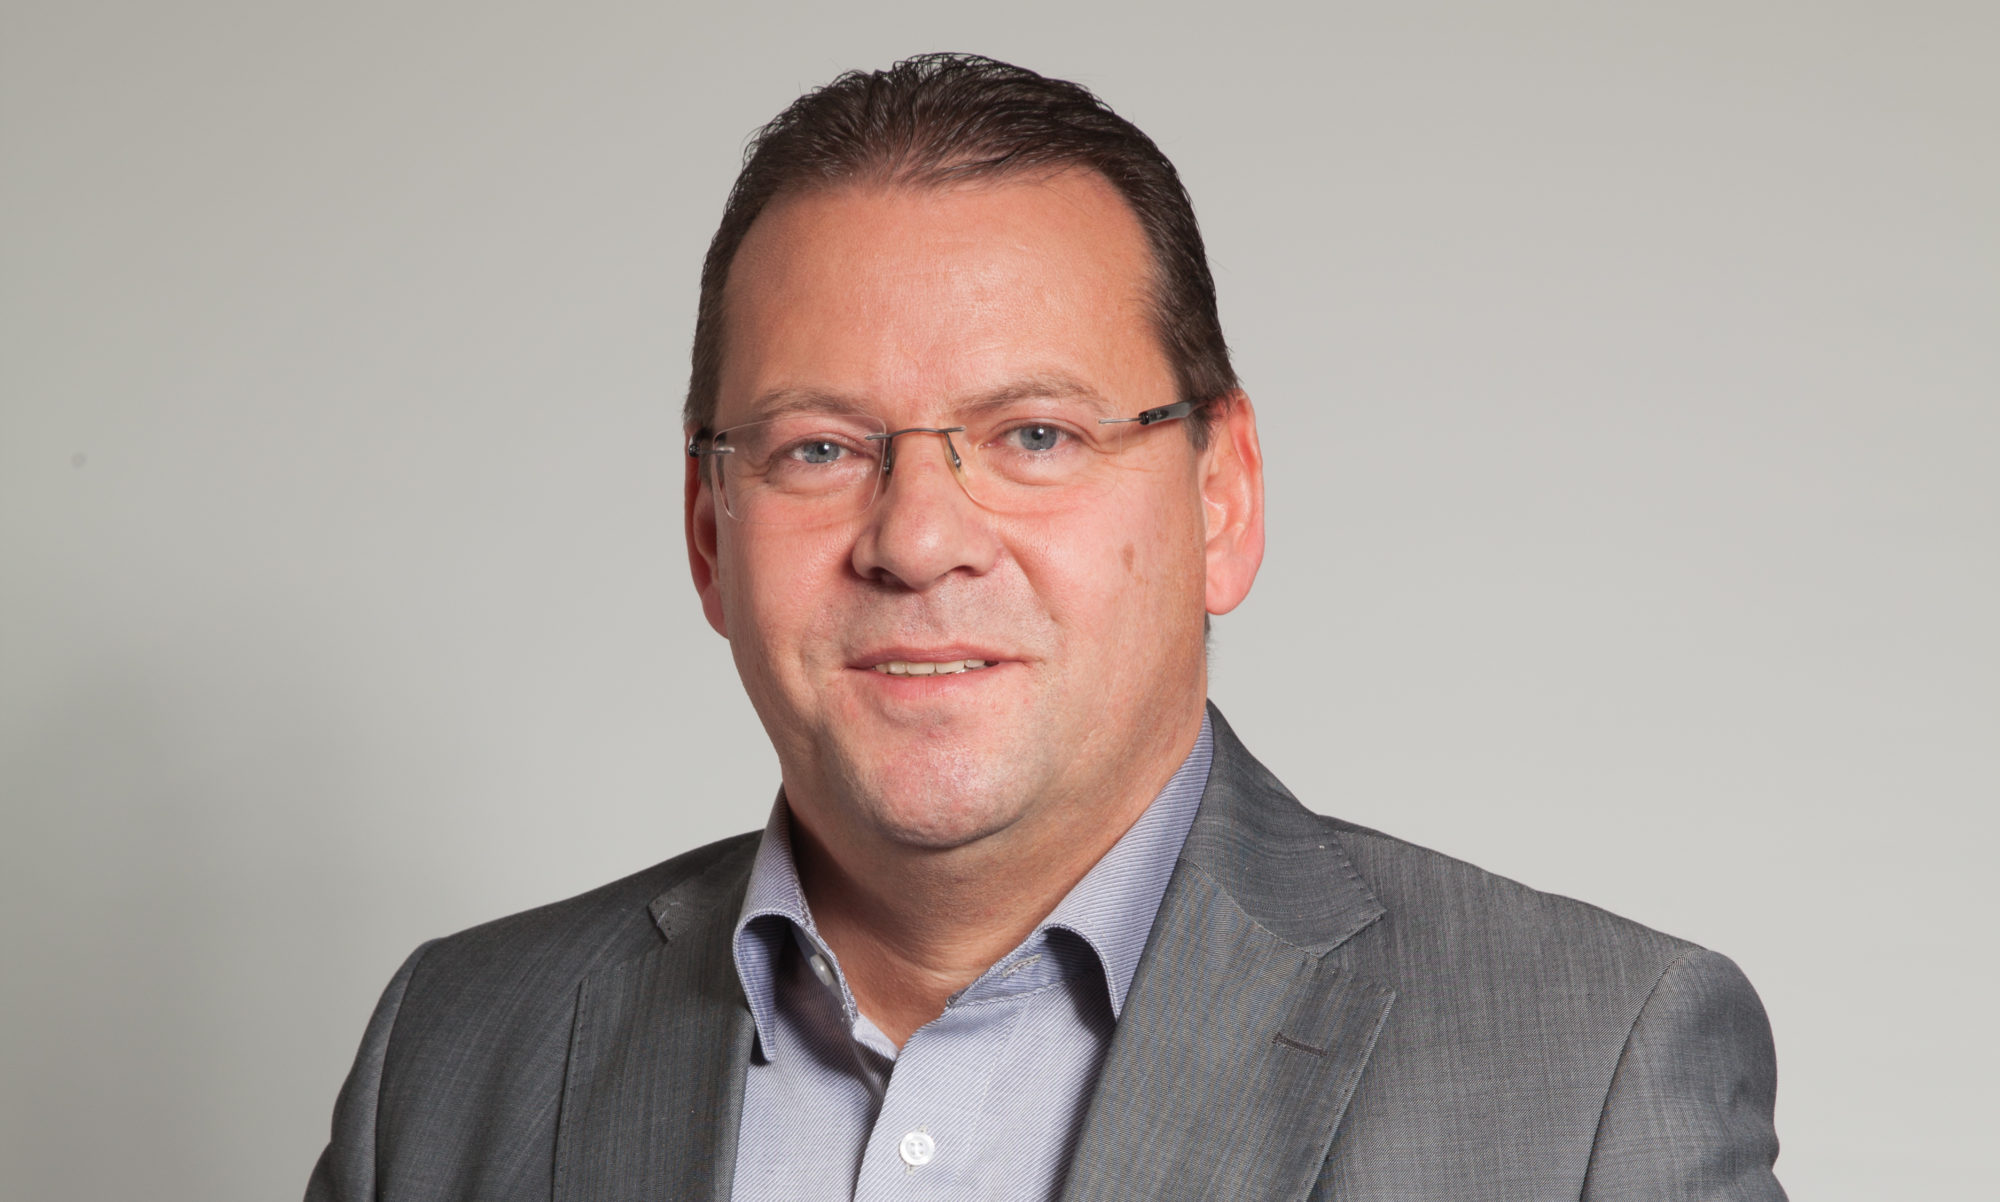 Klaus Breuer